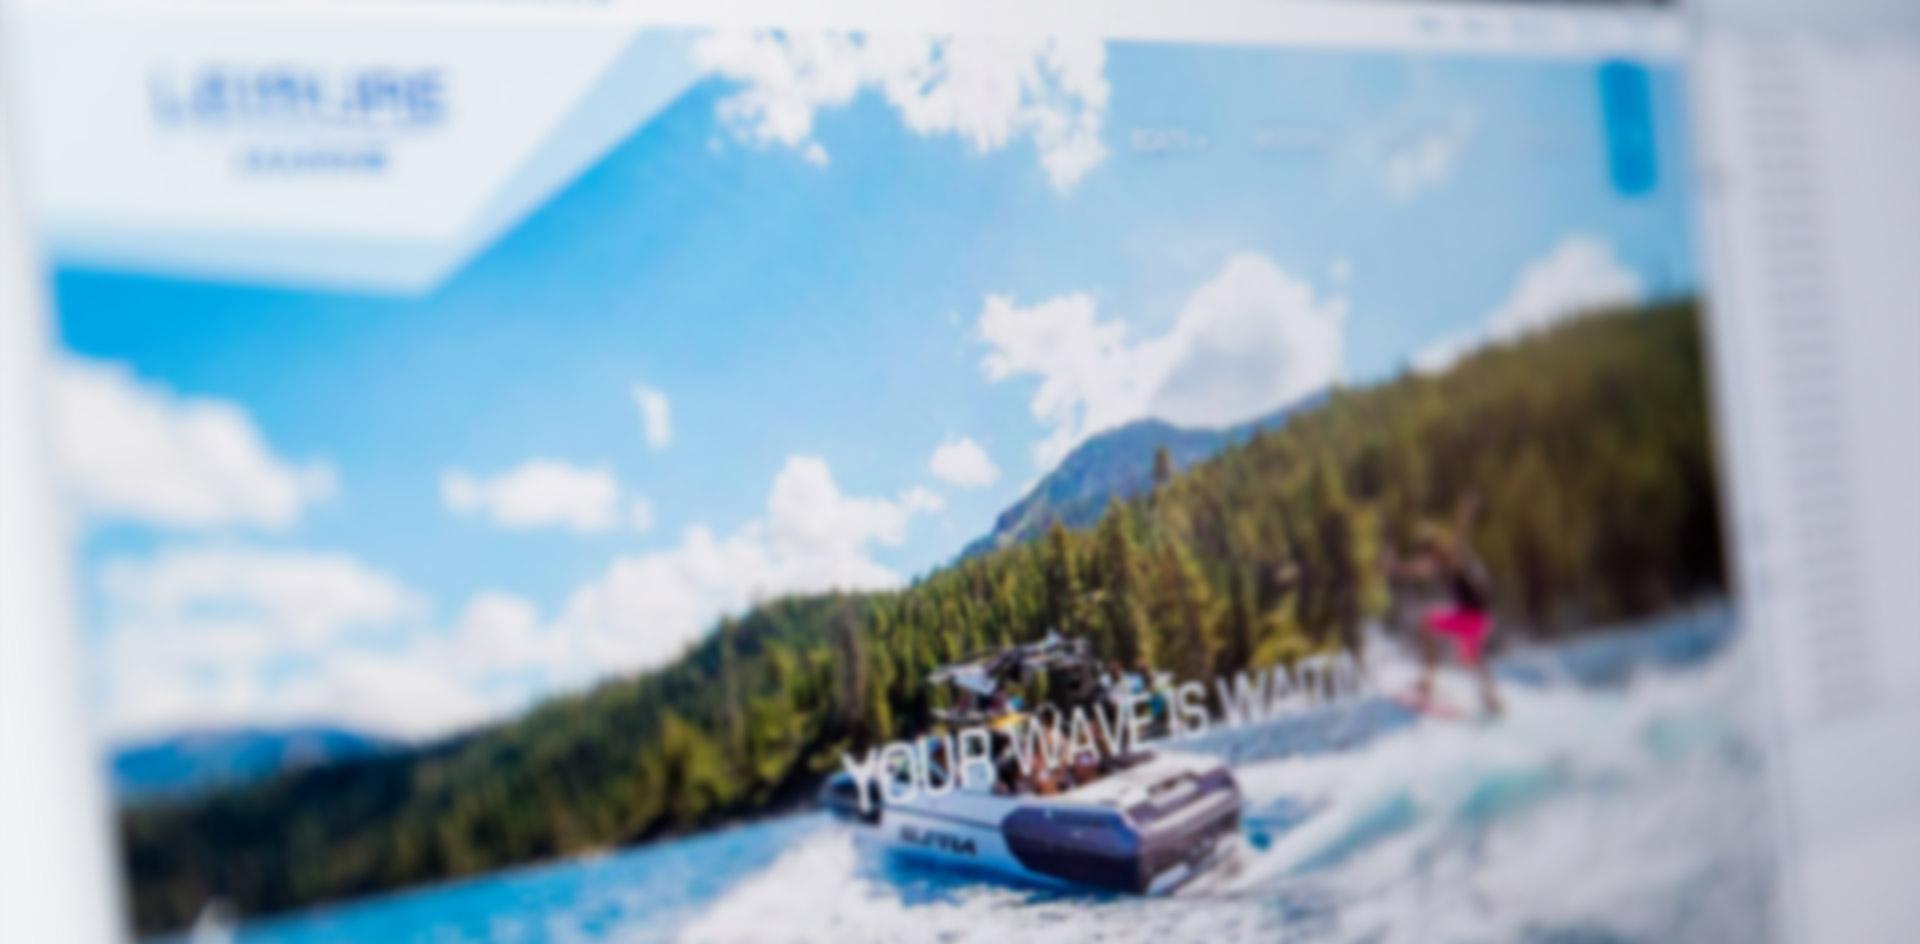 Leisuremarine Web Design & Graphic Design by Black Rooster Studios